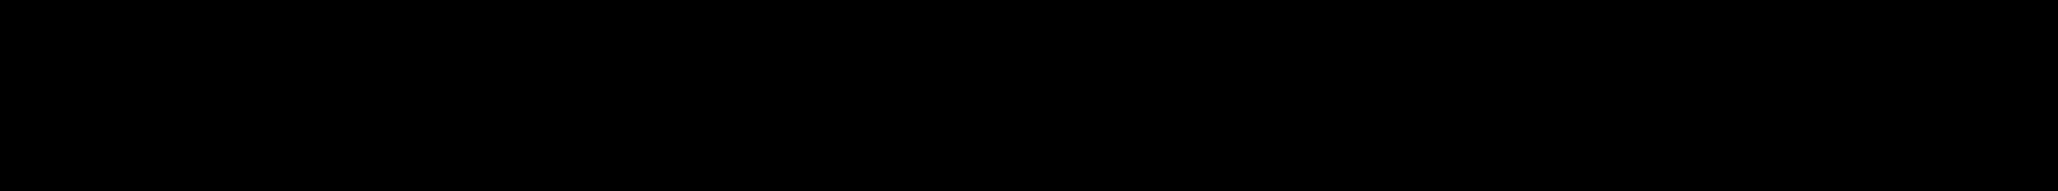 Design System B 500R